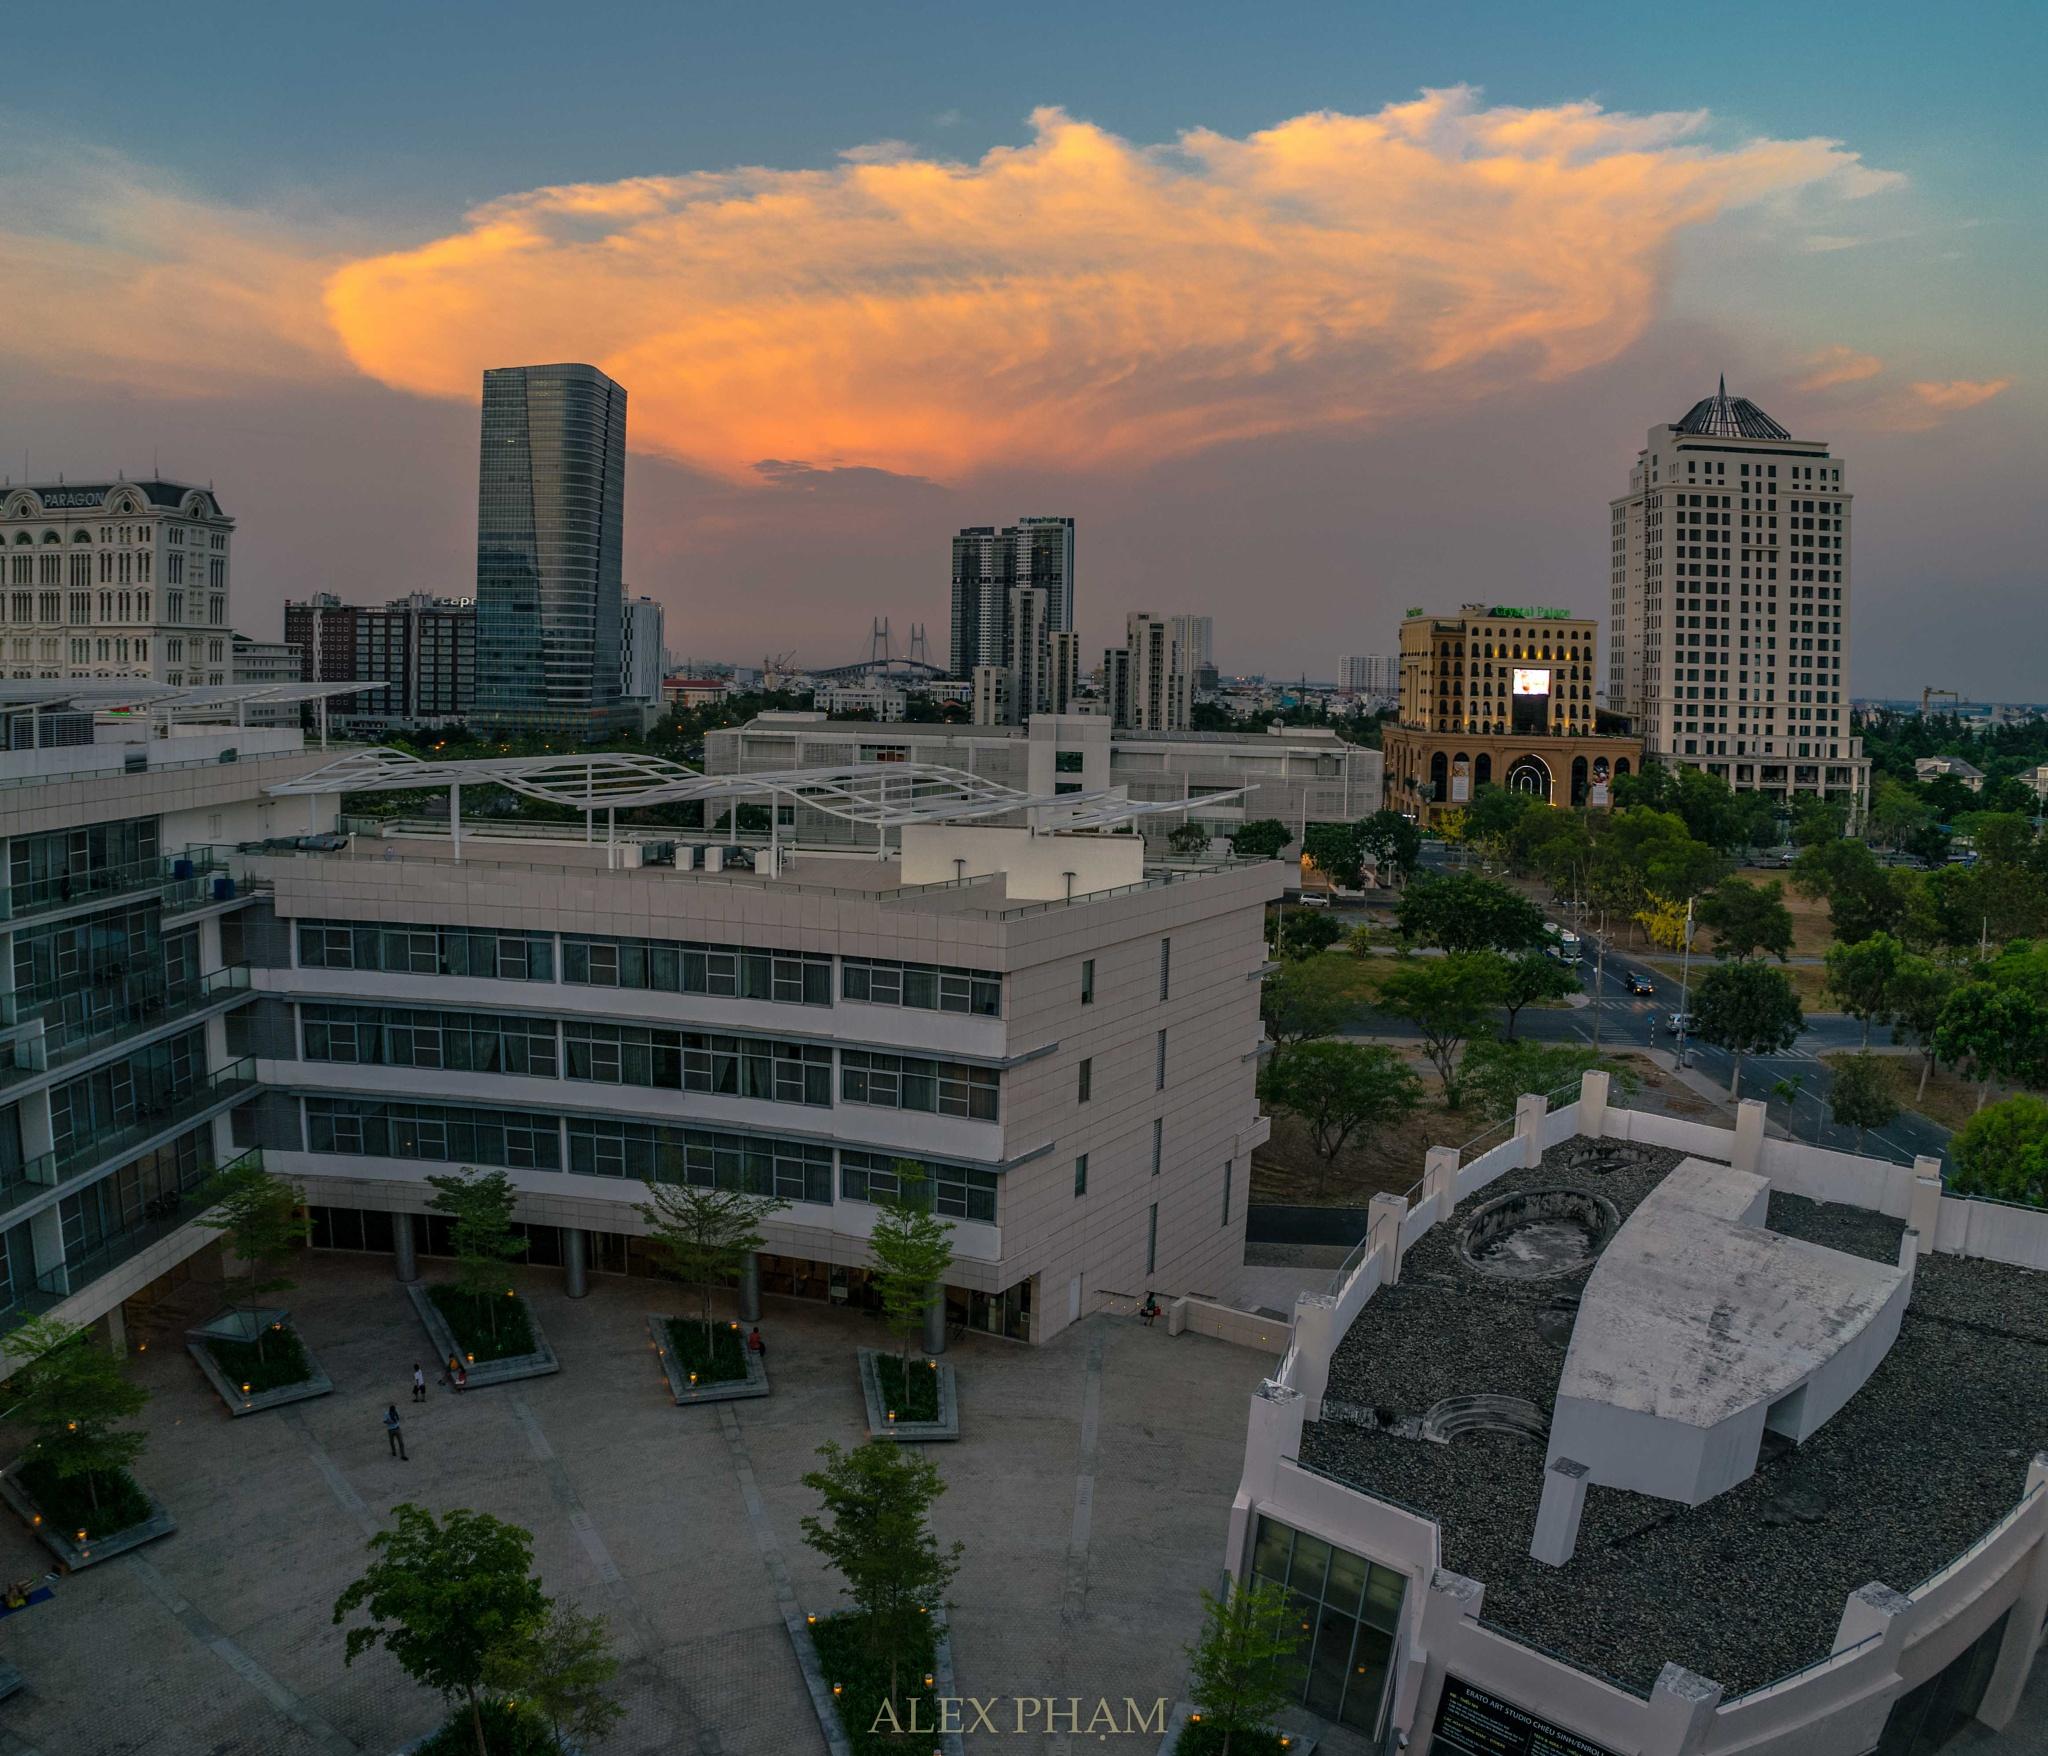 Sunset in my city by Alex Pham